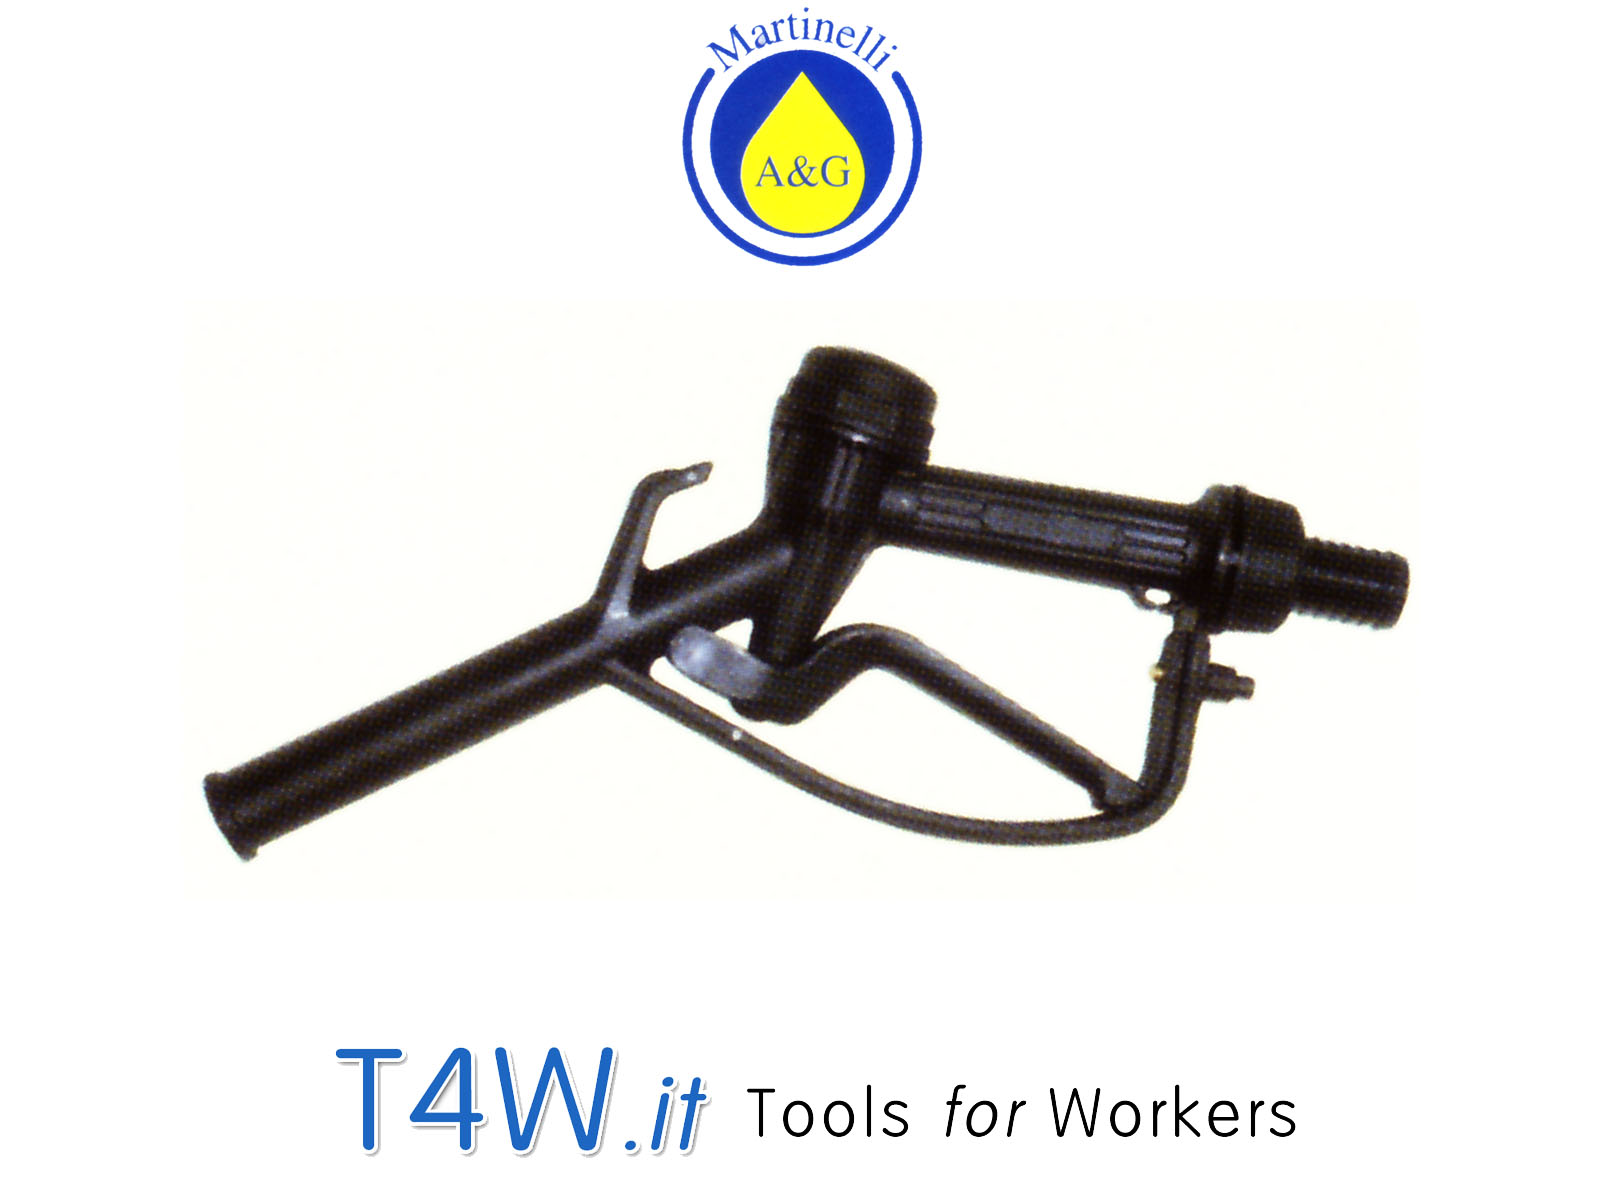 Pistola prolipopilene per gasolio Art. 2652 Martinelli -